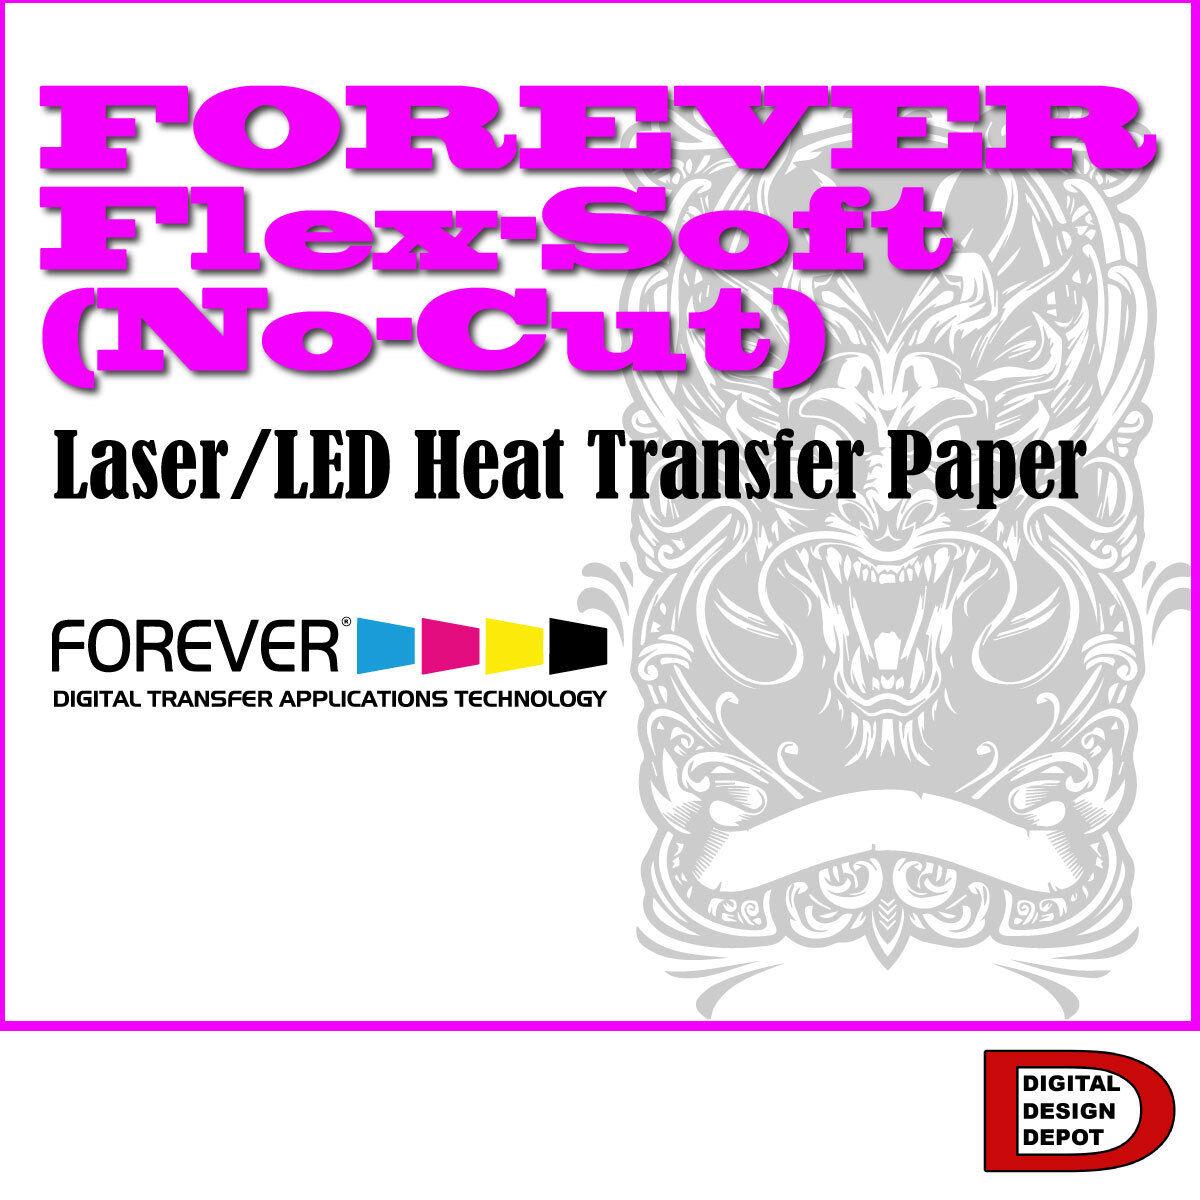 NEW Heat Transfer Paper FOREVER Flex-Soft No-Cut A&B Laser P